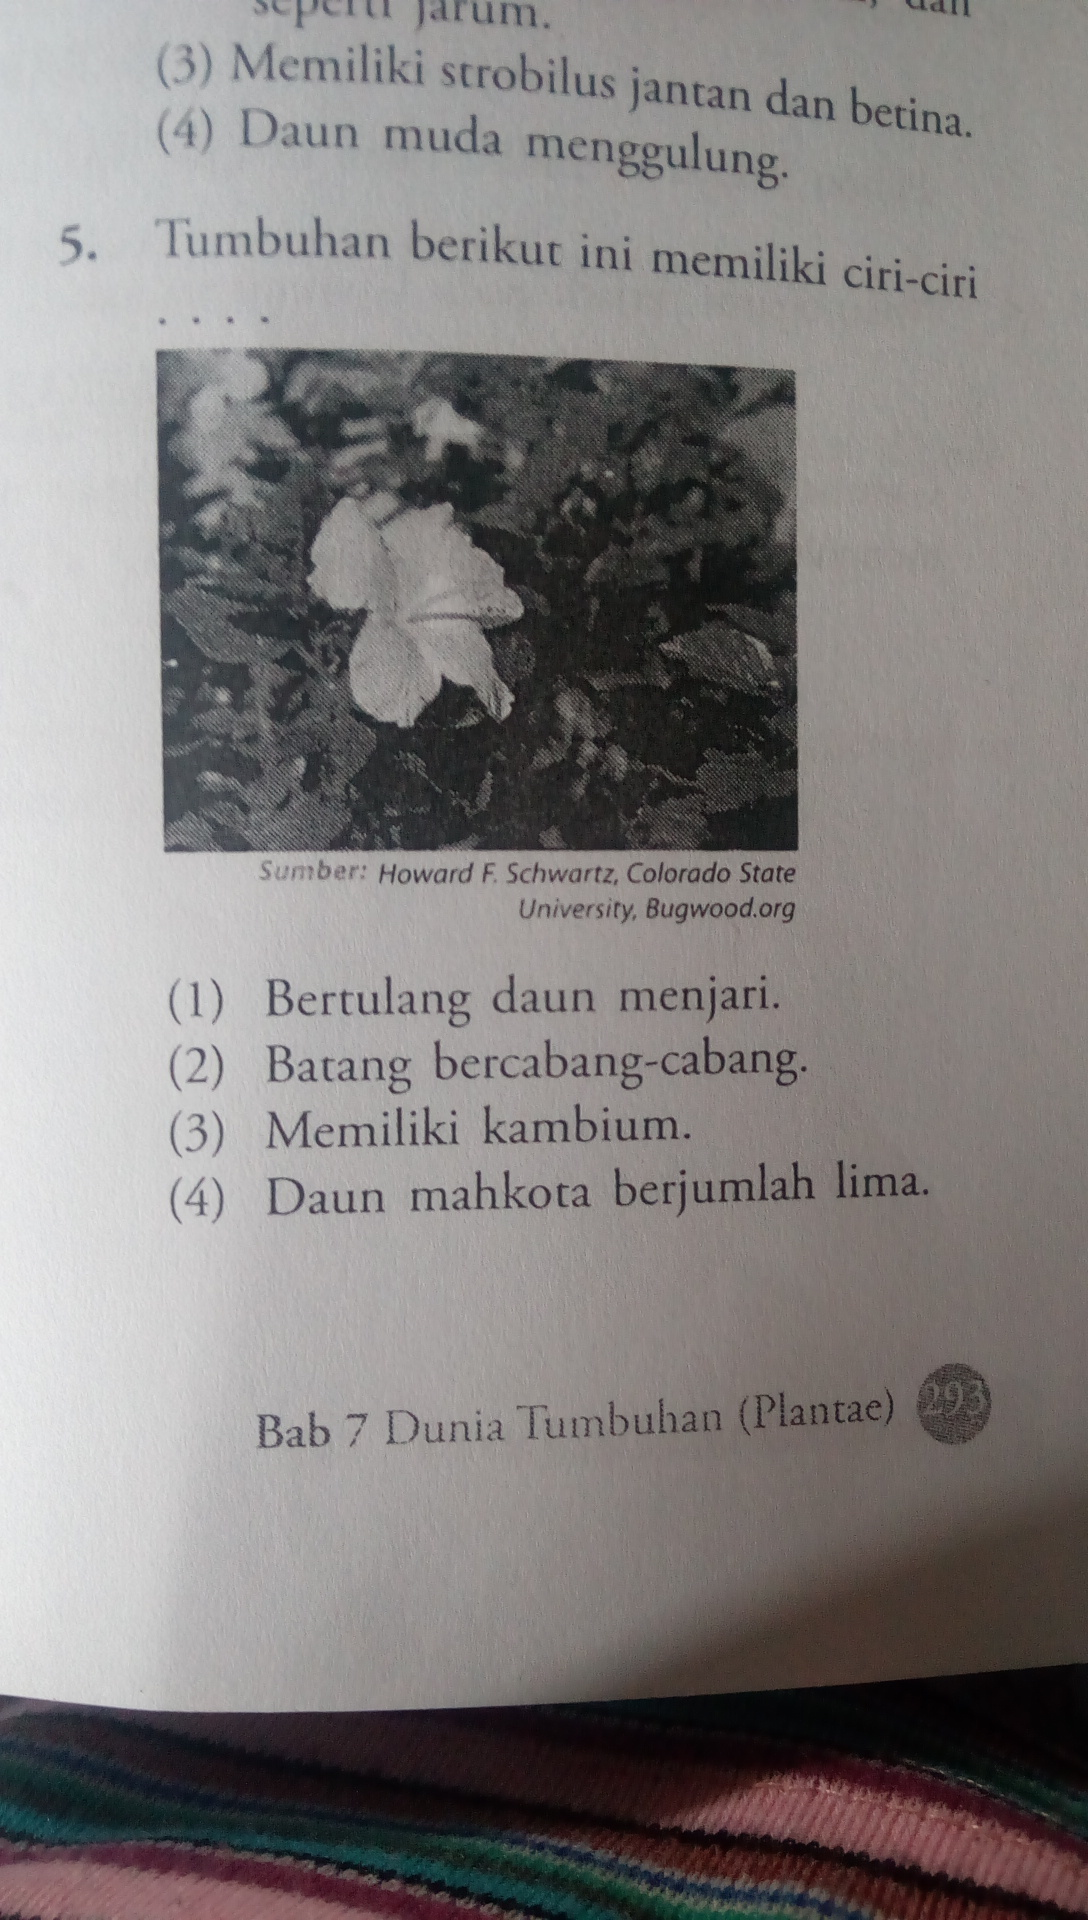 Tumbuhan berikut ini memiliki ciri-ciri - Brainly.co.id